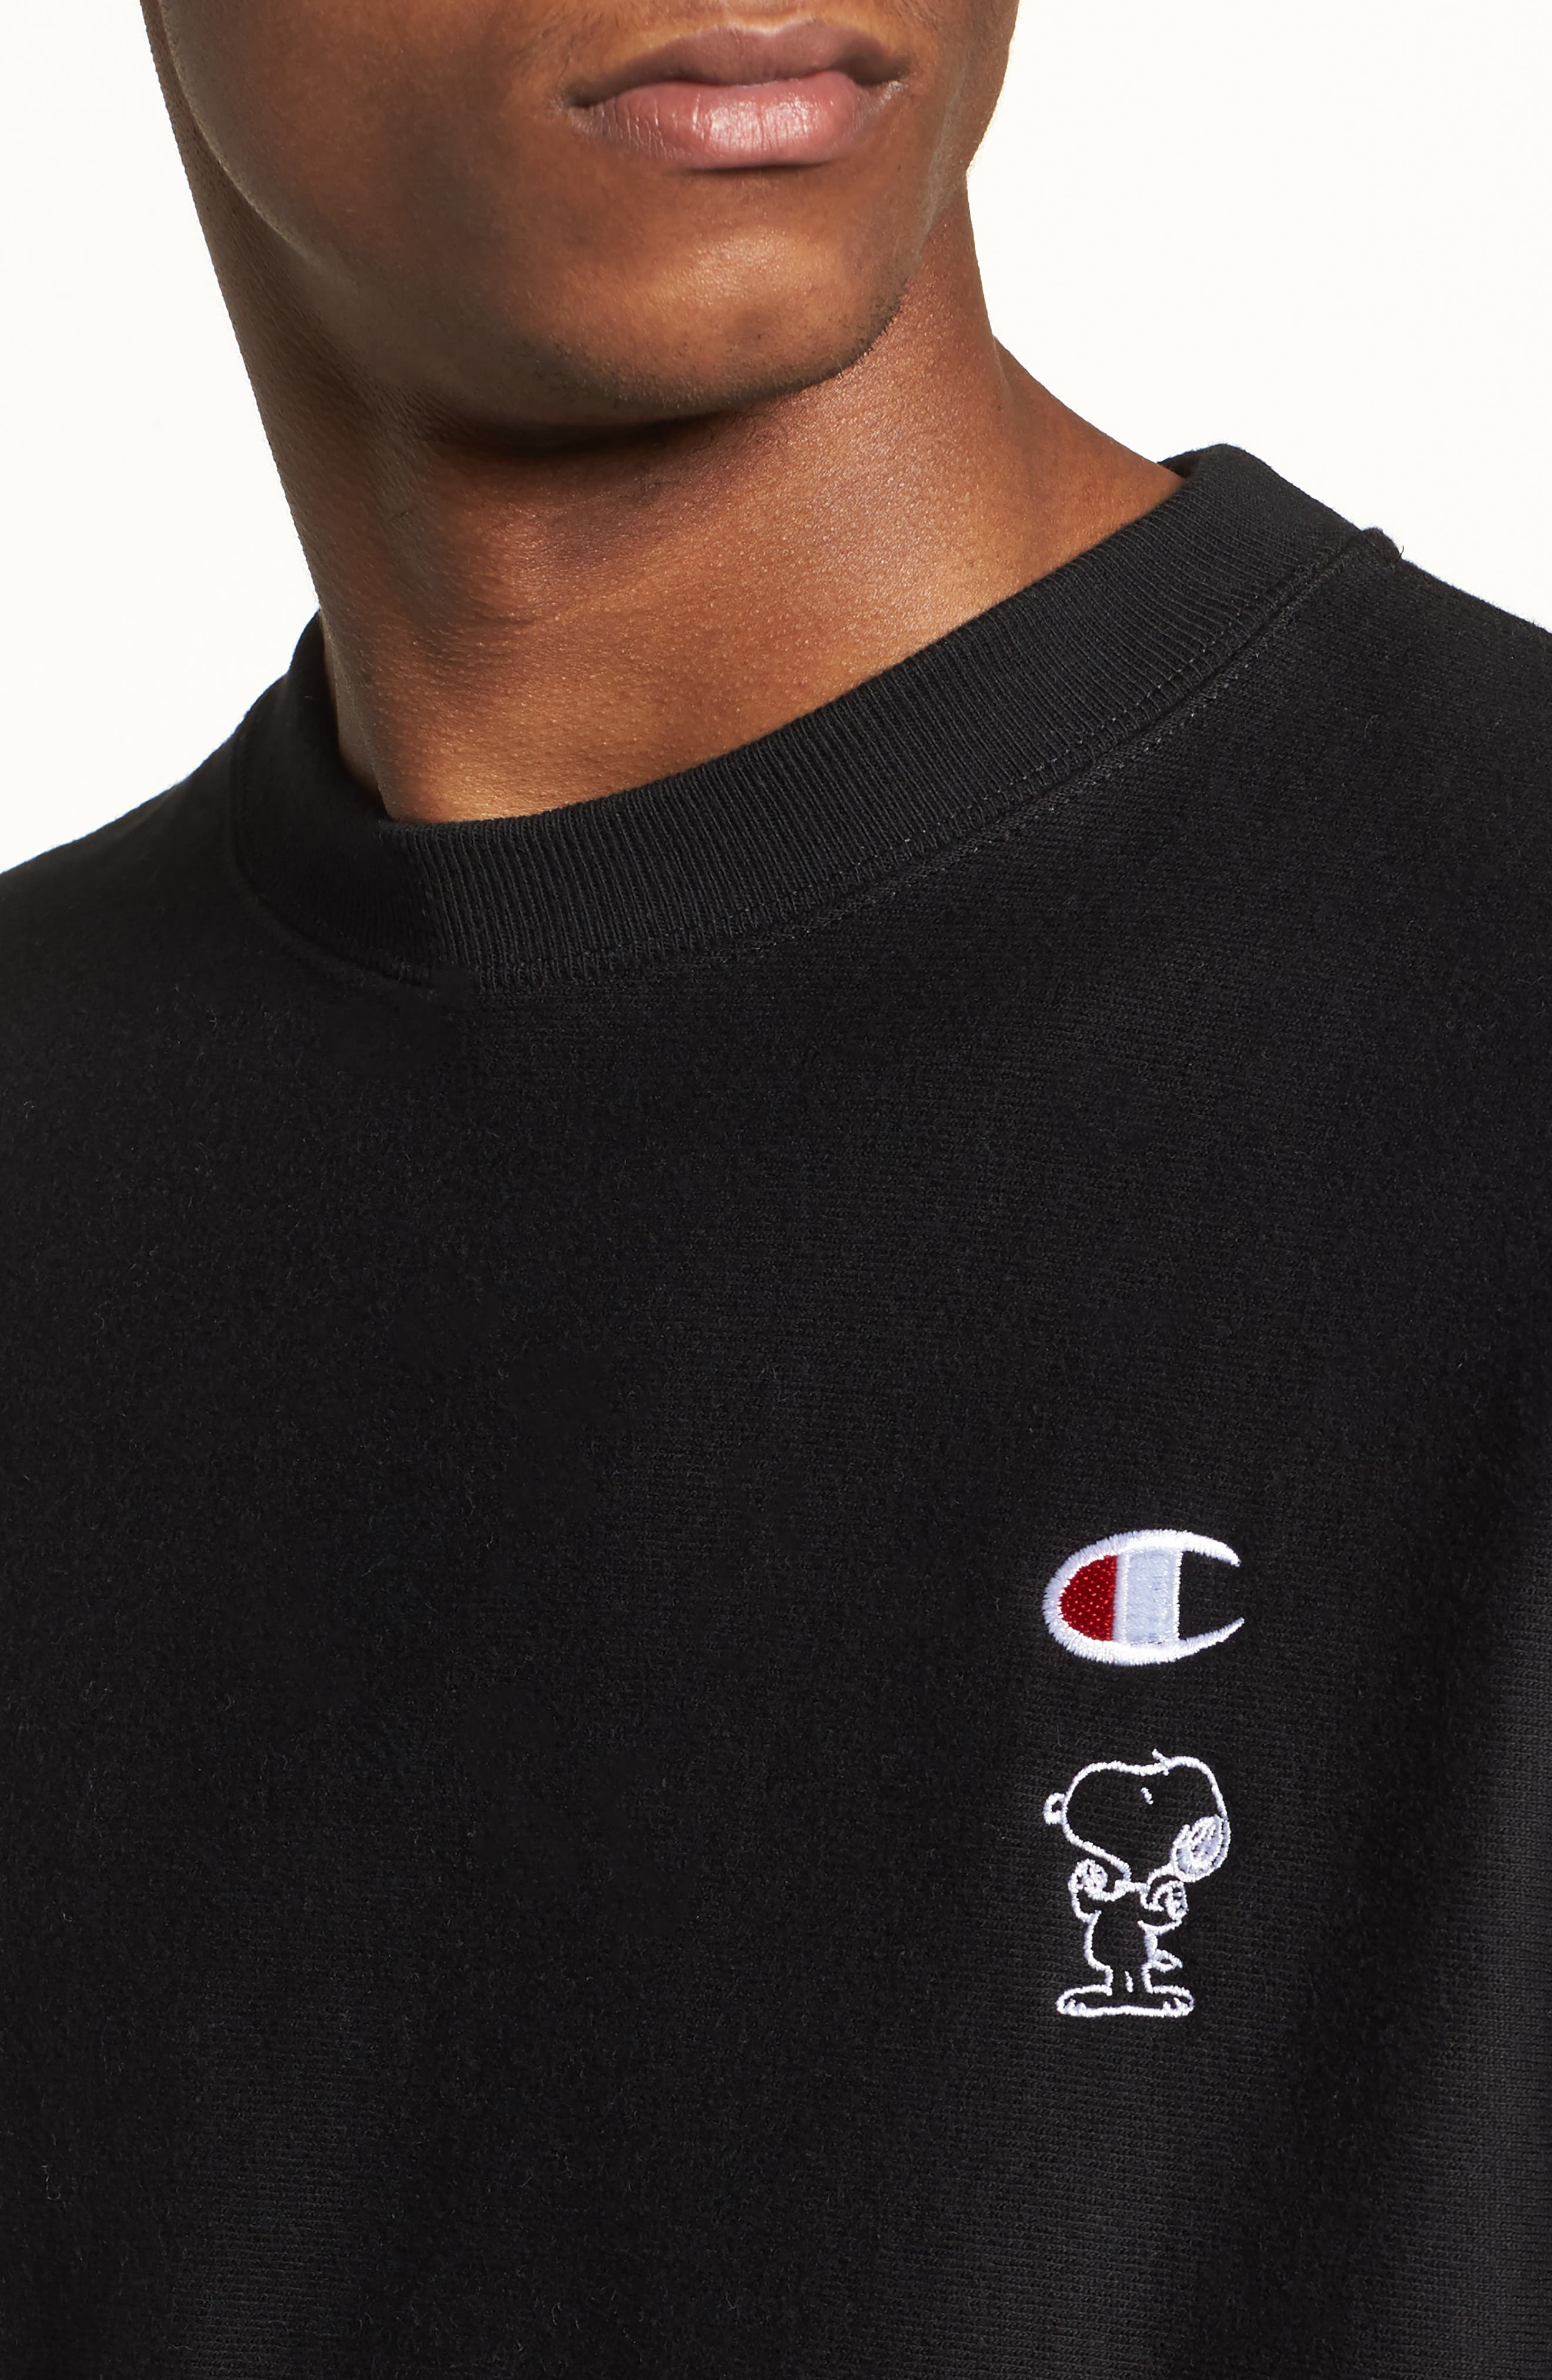 Snoopy Unisex Sweatshirt,                             Alternate thumbnail 4, color,                             001